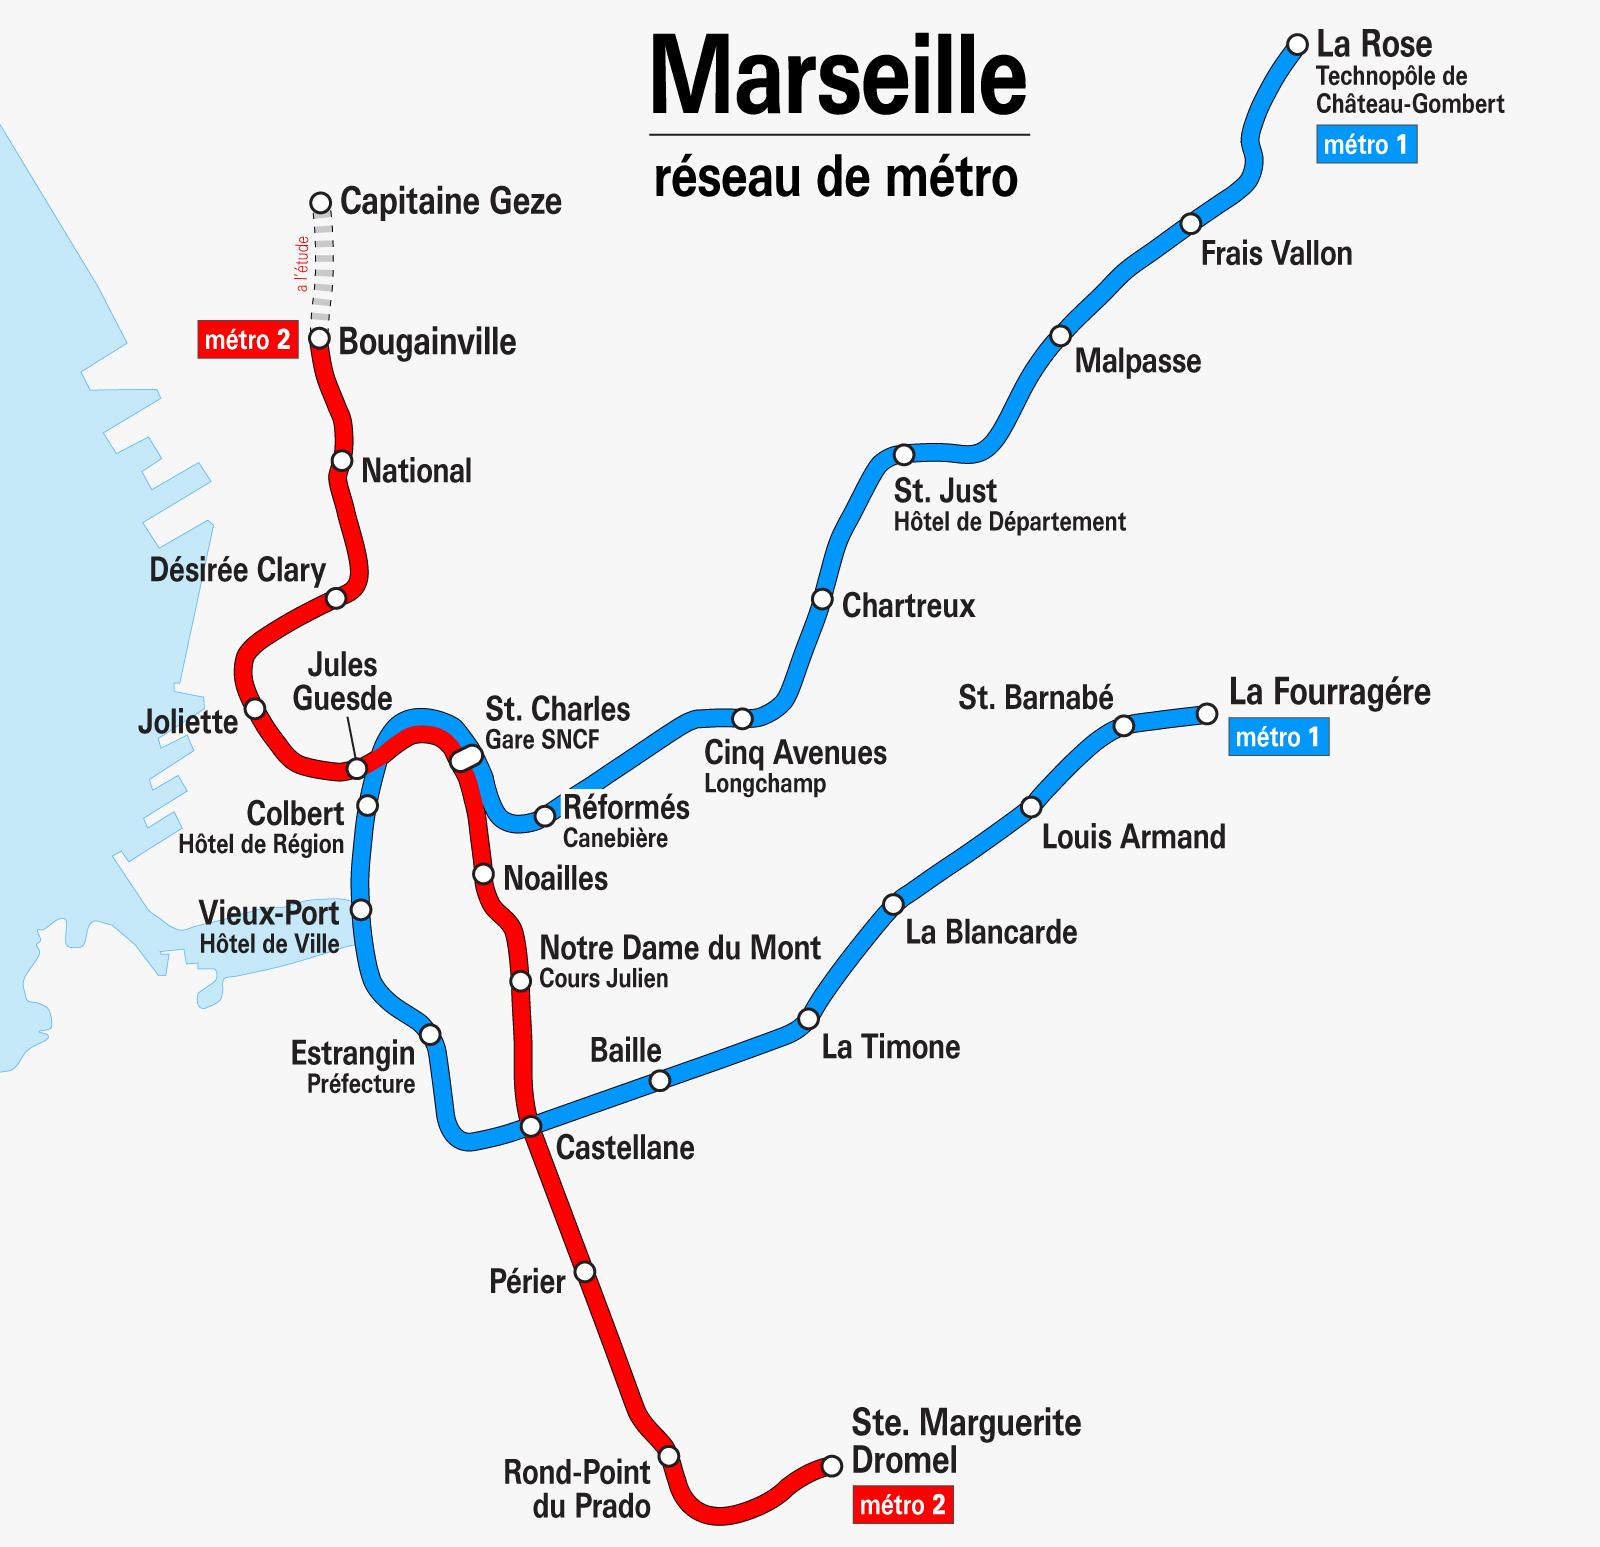 Marseille Metro Marseille métro